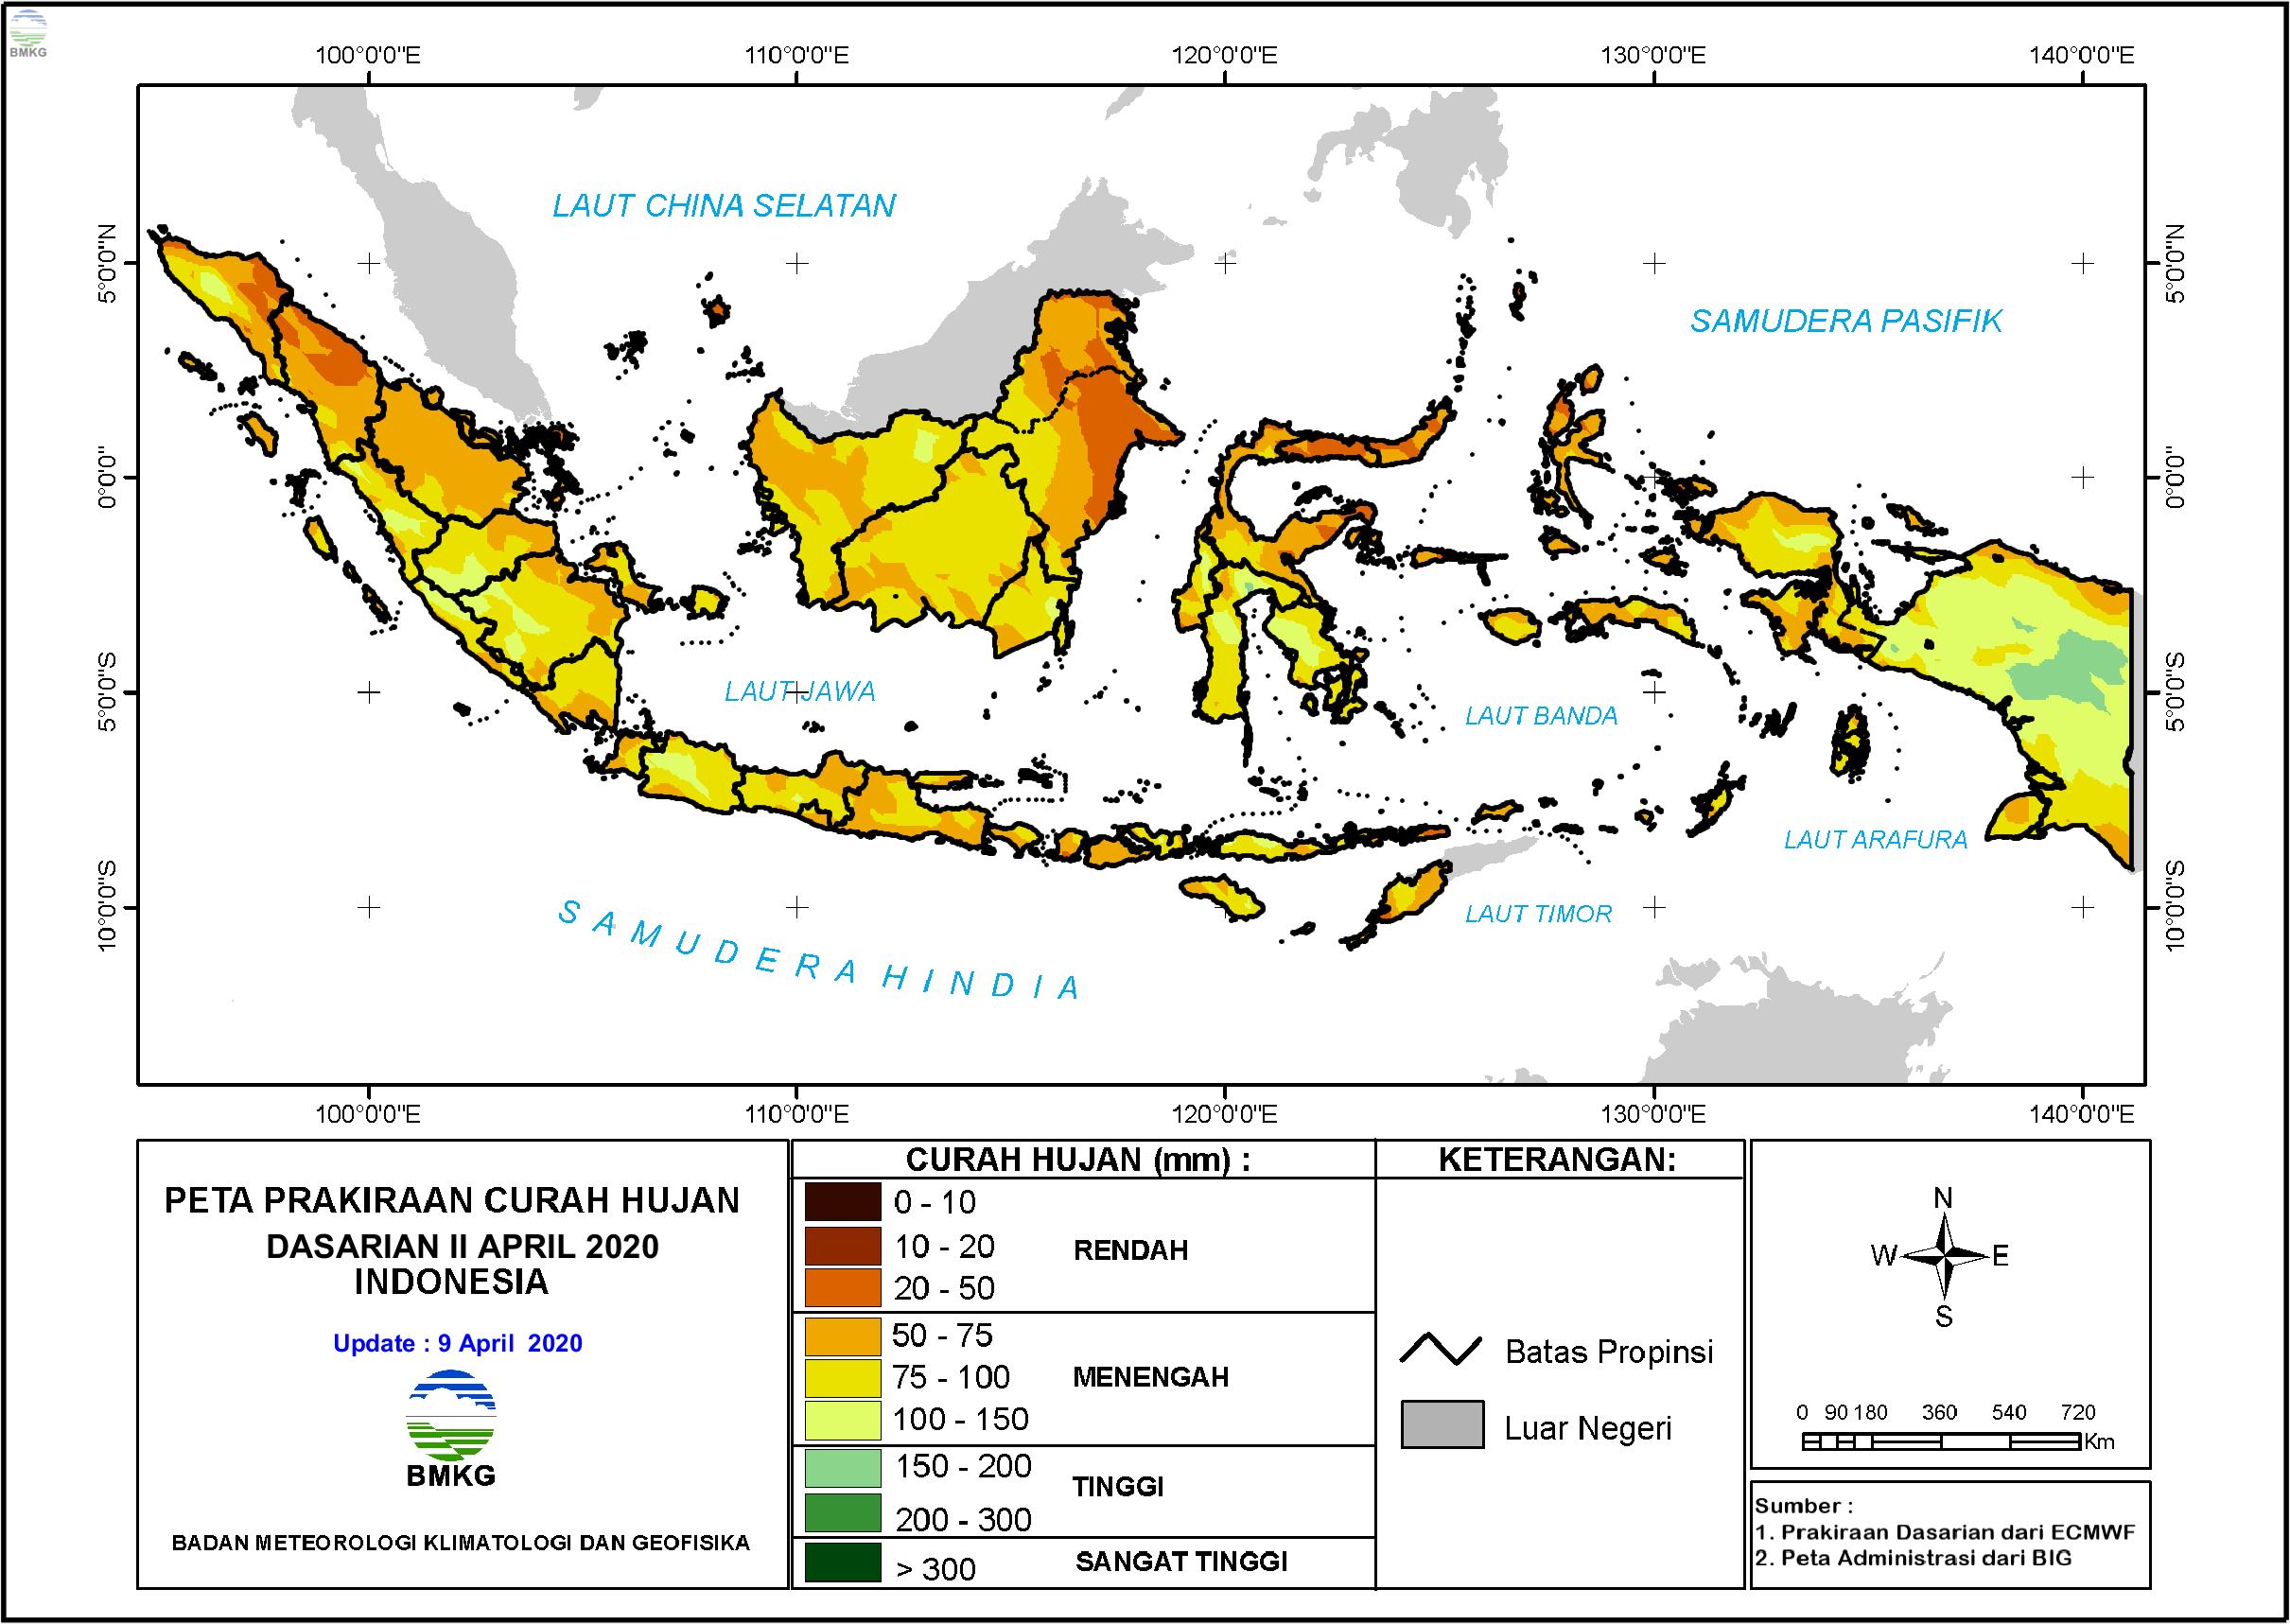 Prakiraan Hujan Dasarian II - III April dan I Mei 2020